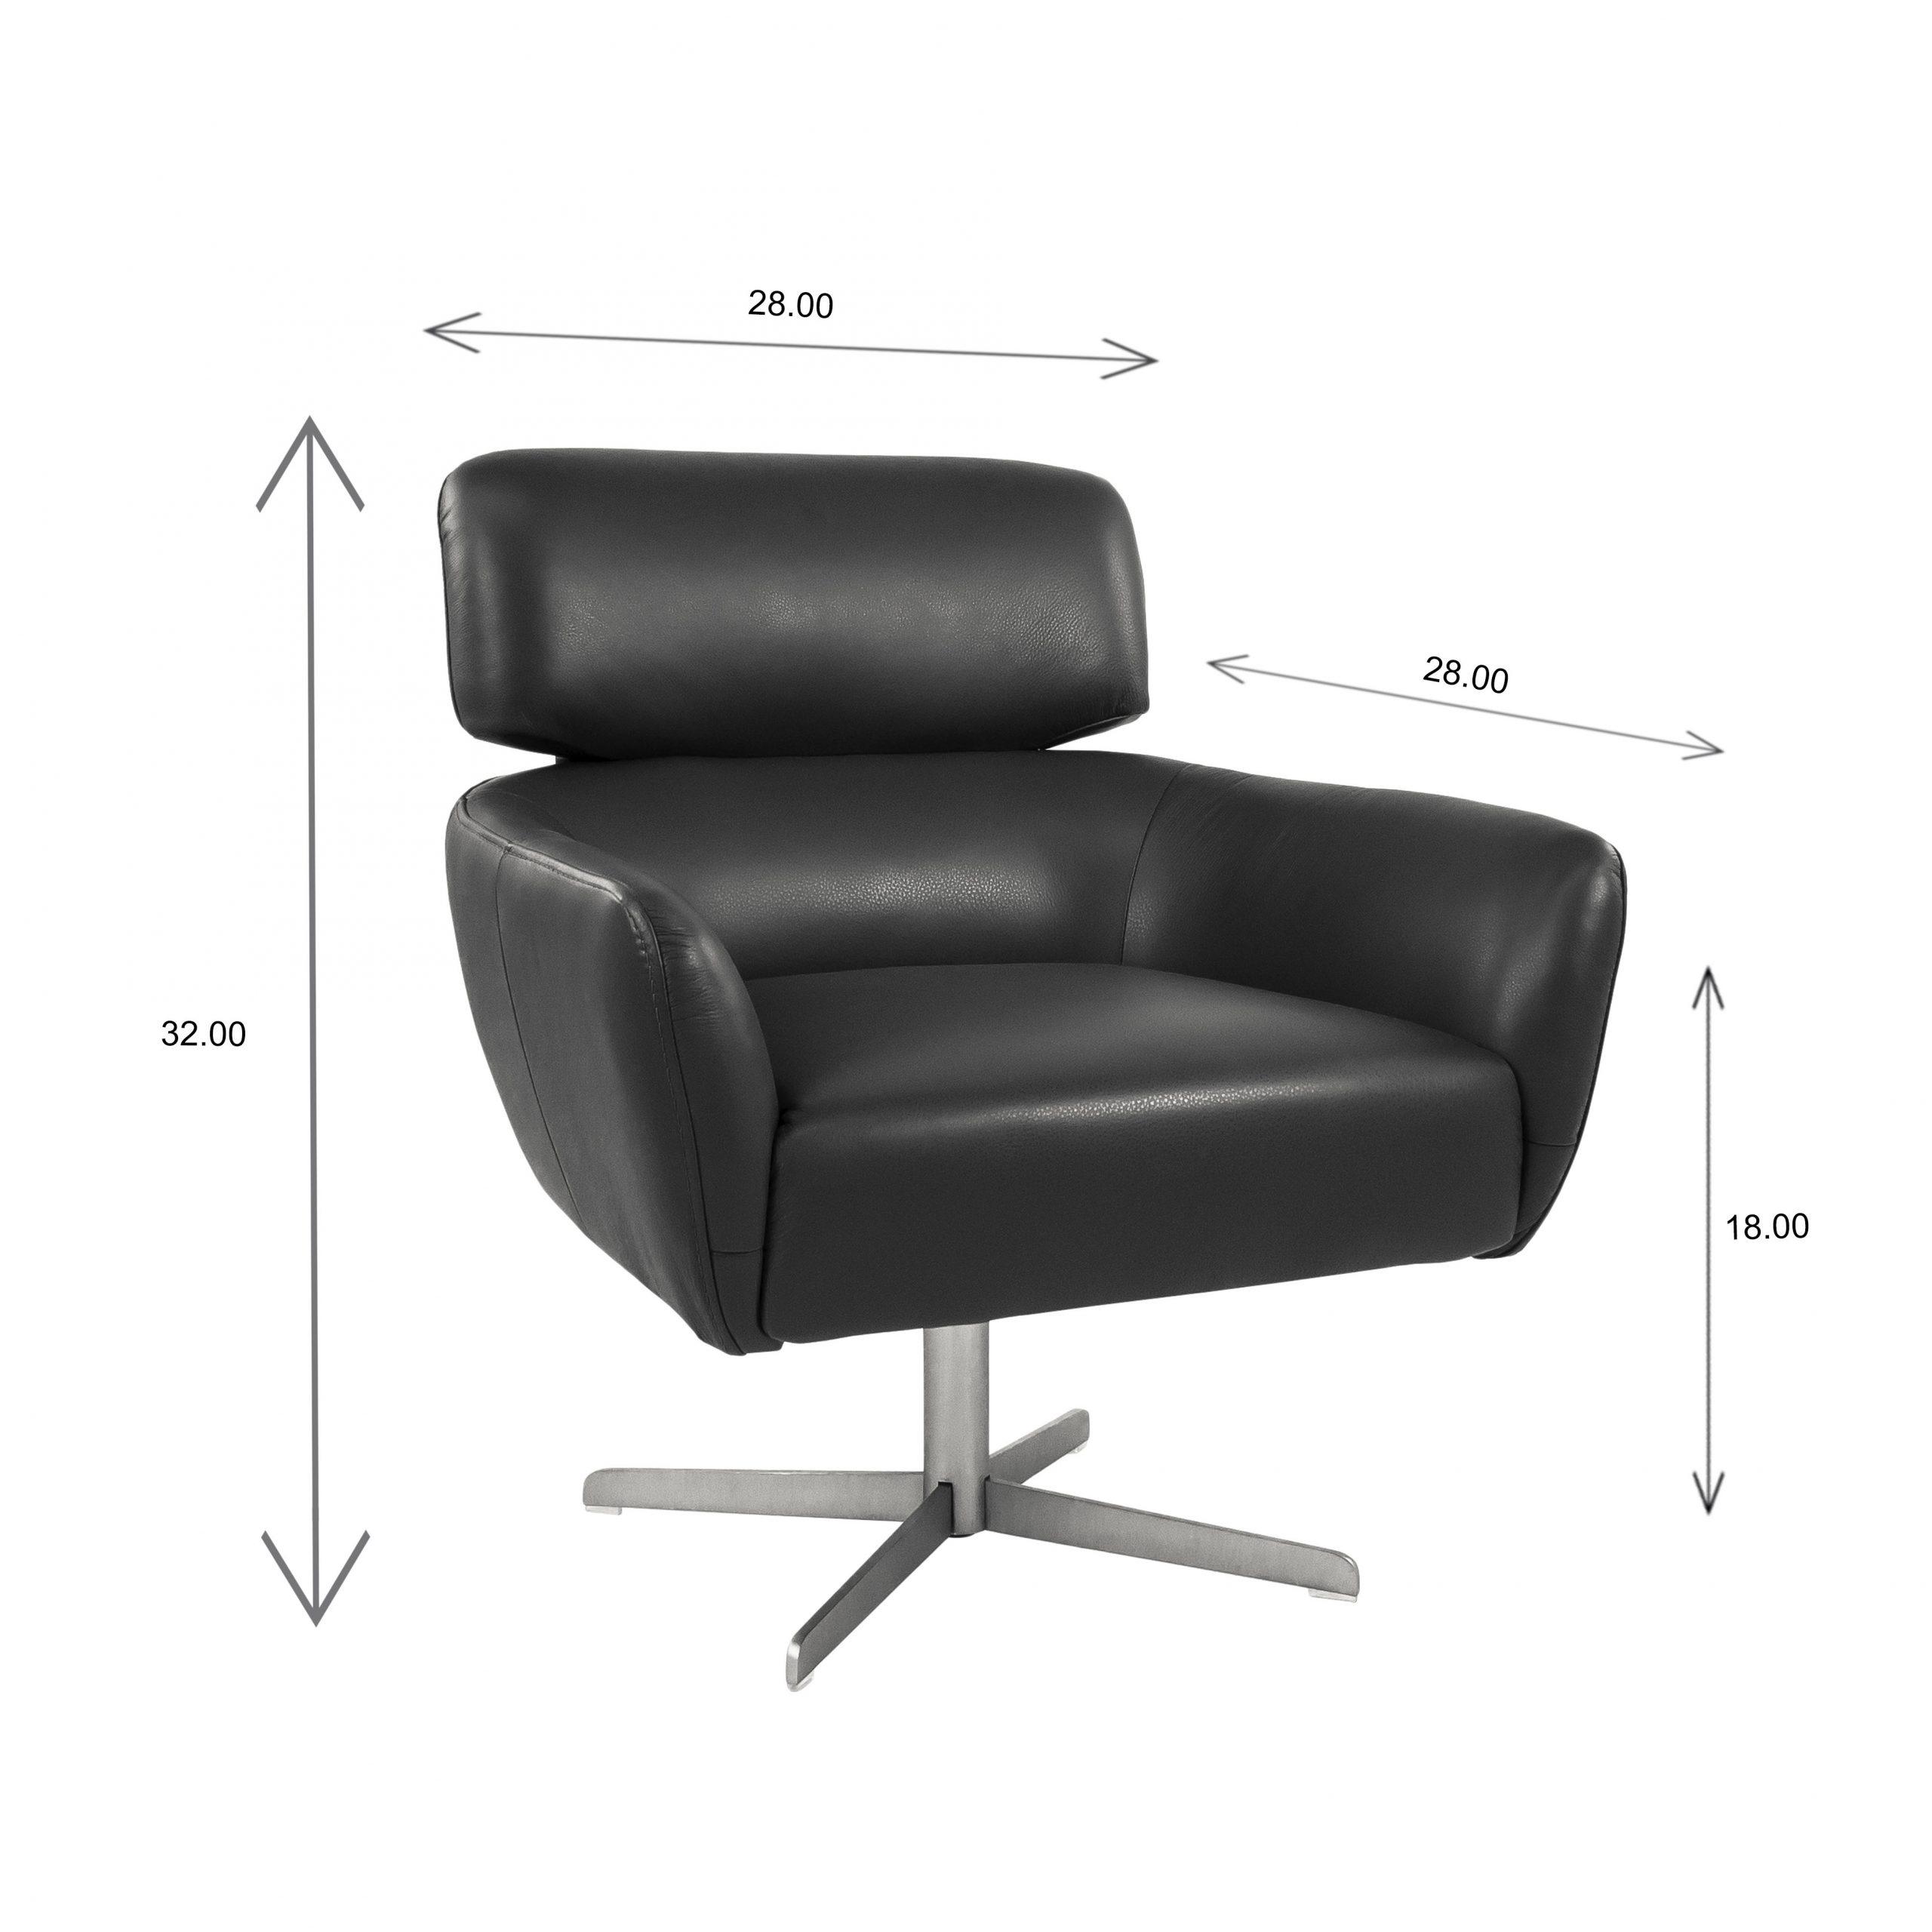 Haley Chair Dimensions